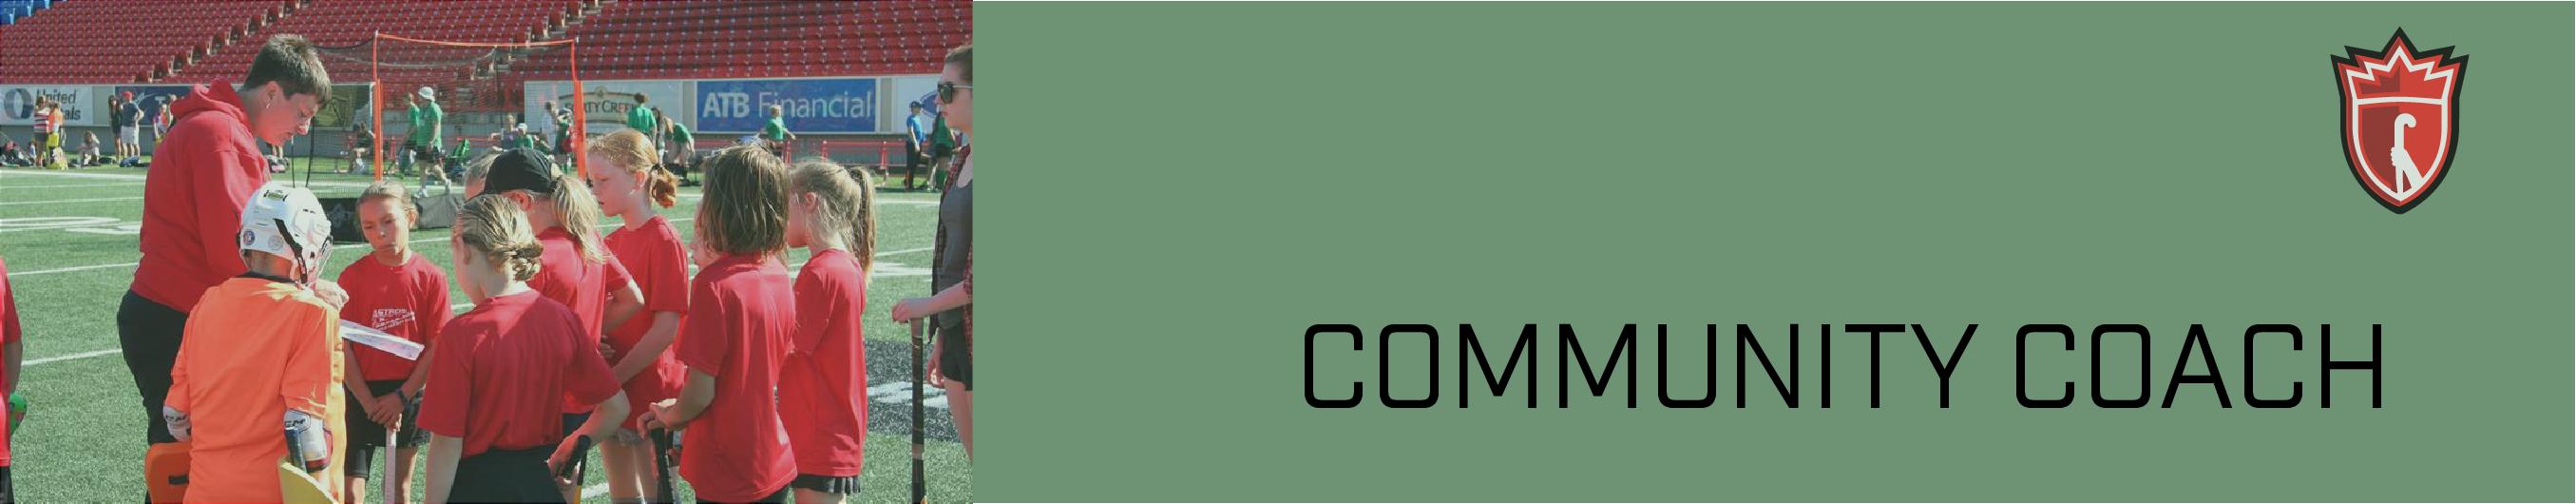 Coach - Community